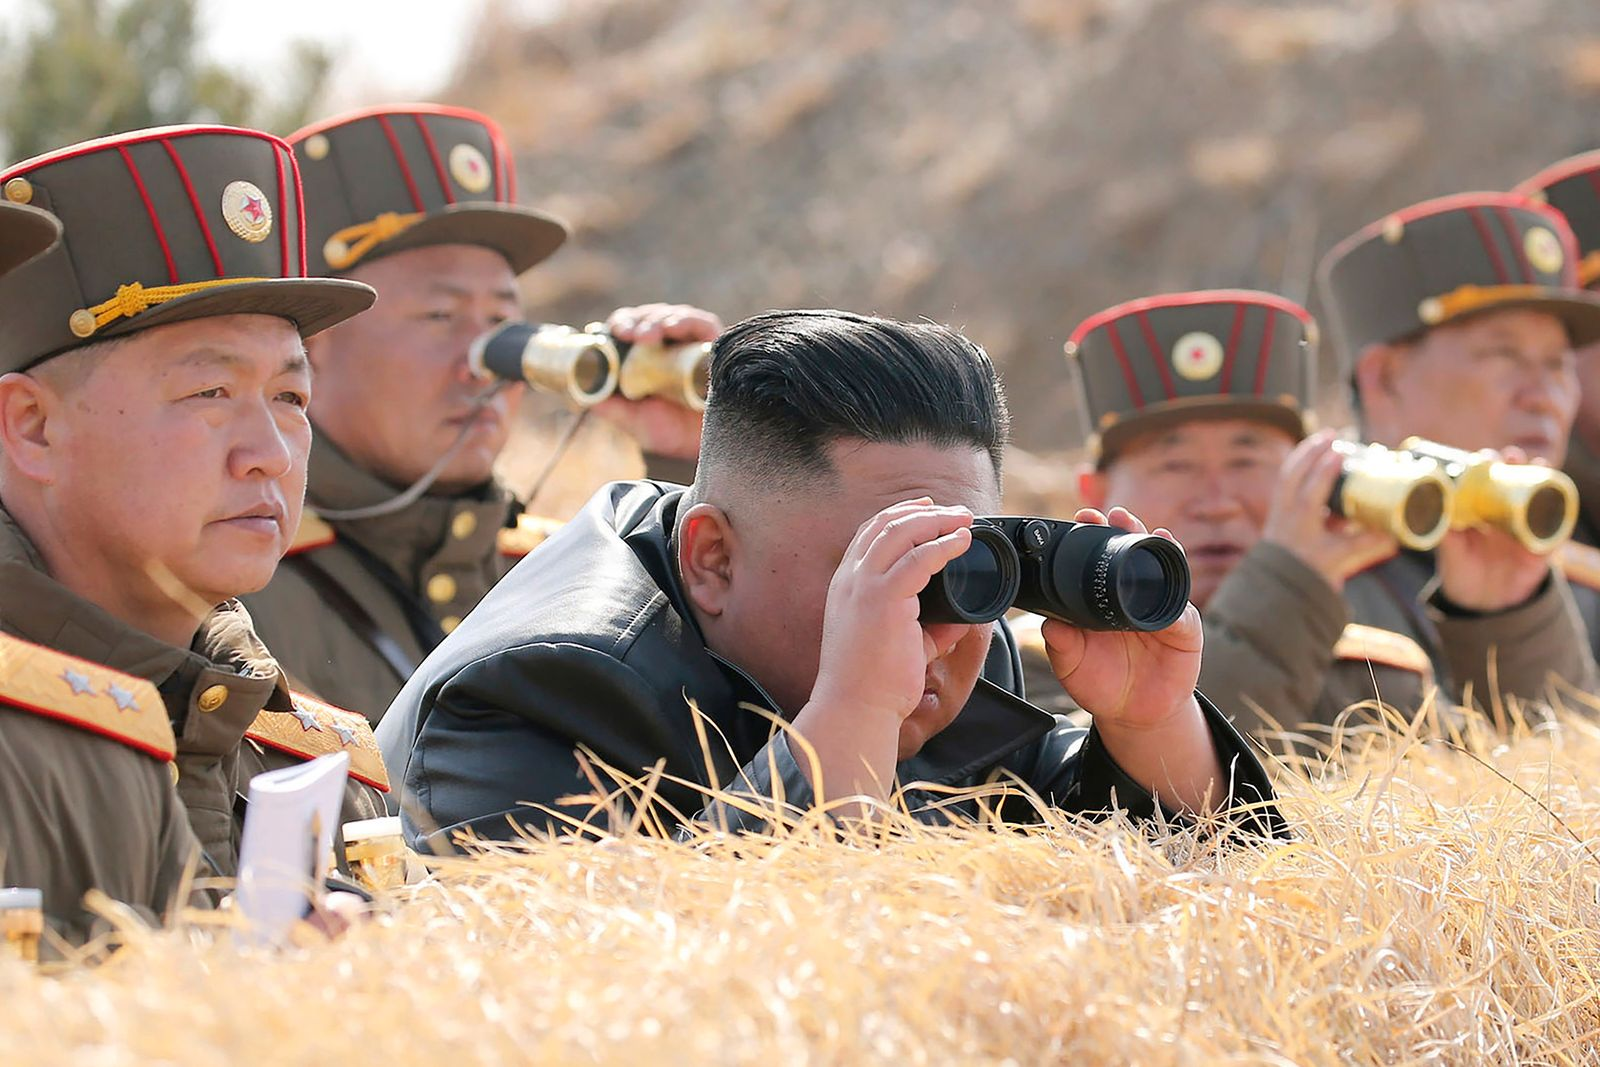 Konflikt Nordkorea-Südkorea